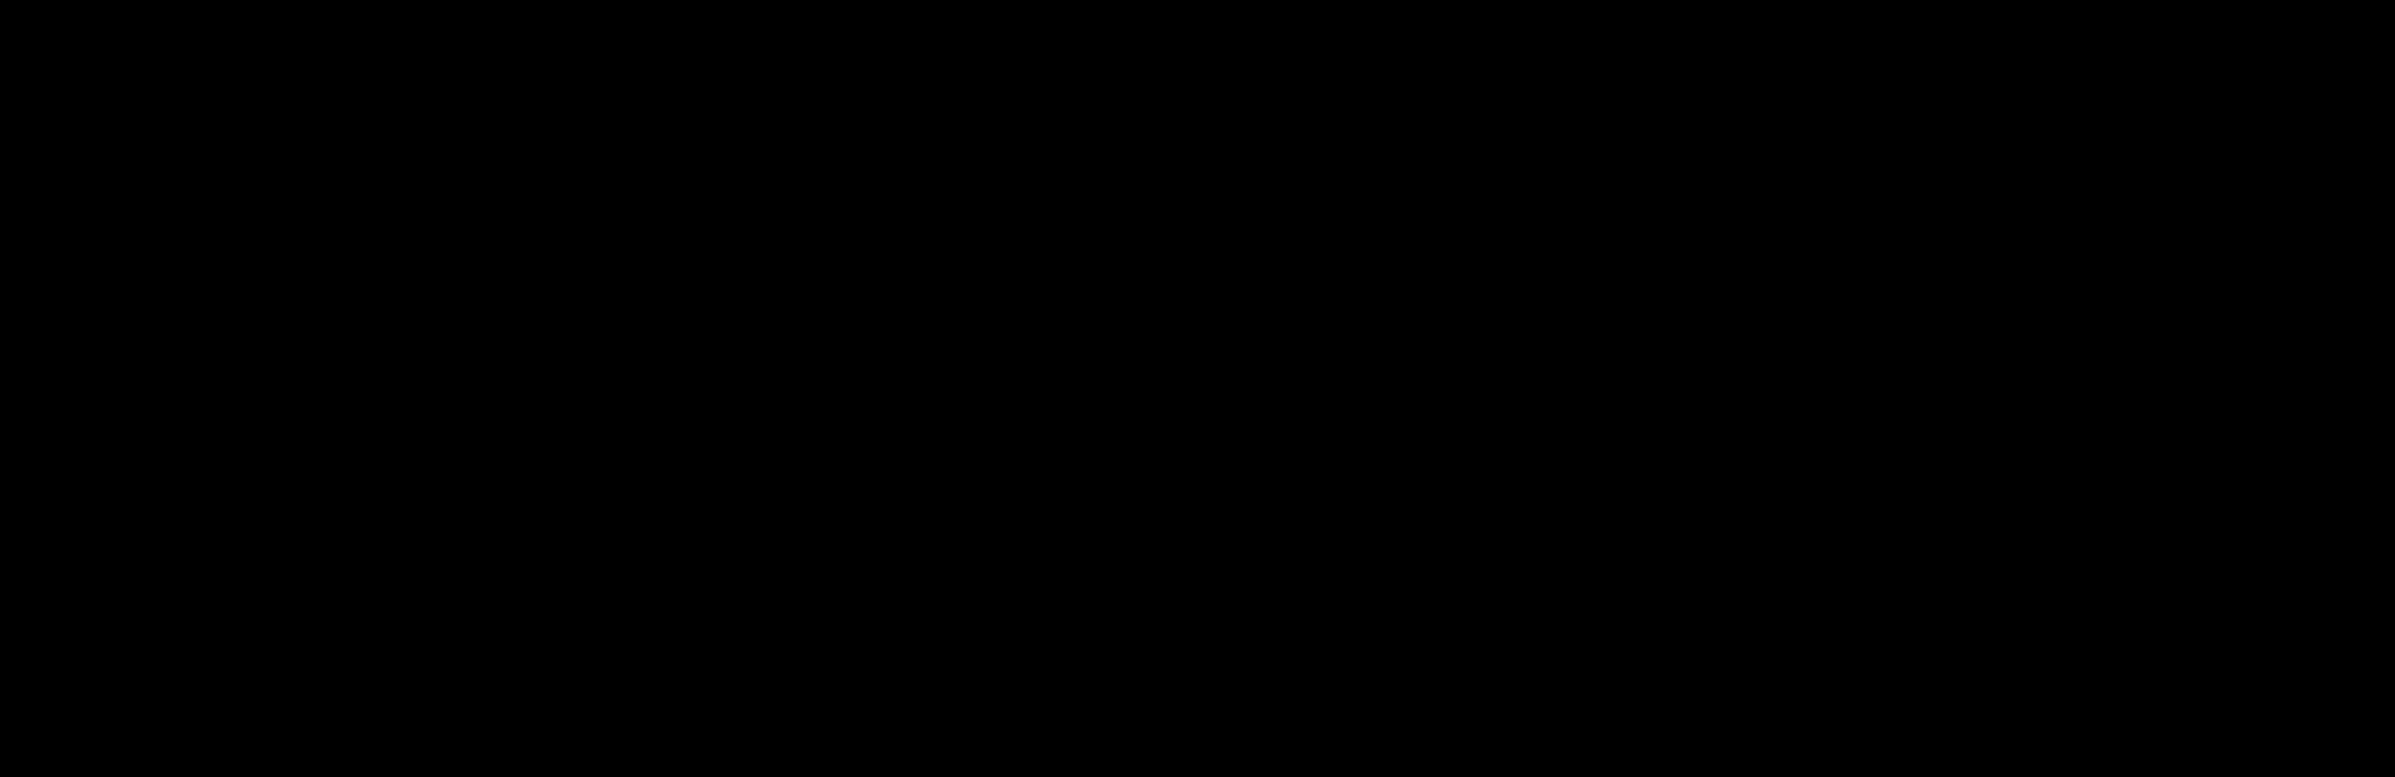 ALV PBNB 2018